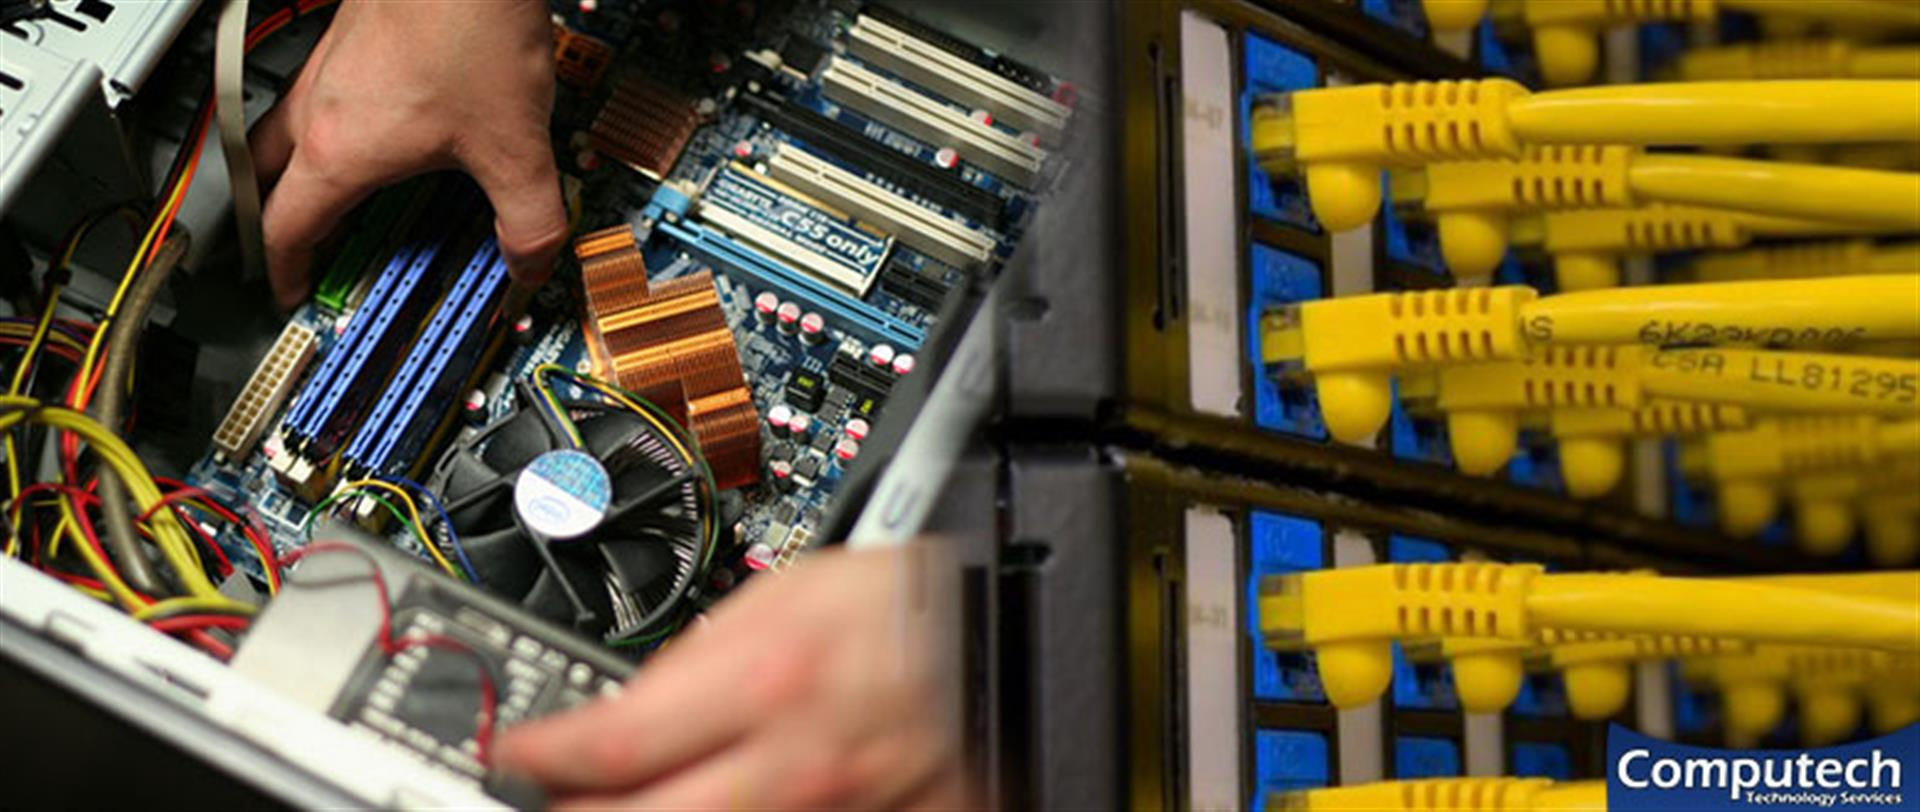 Lawrenceville Georgia On Site PC & Printer Repair, Network, Voice & Data Cabling Contractors